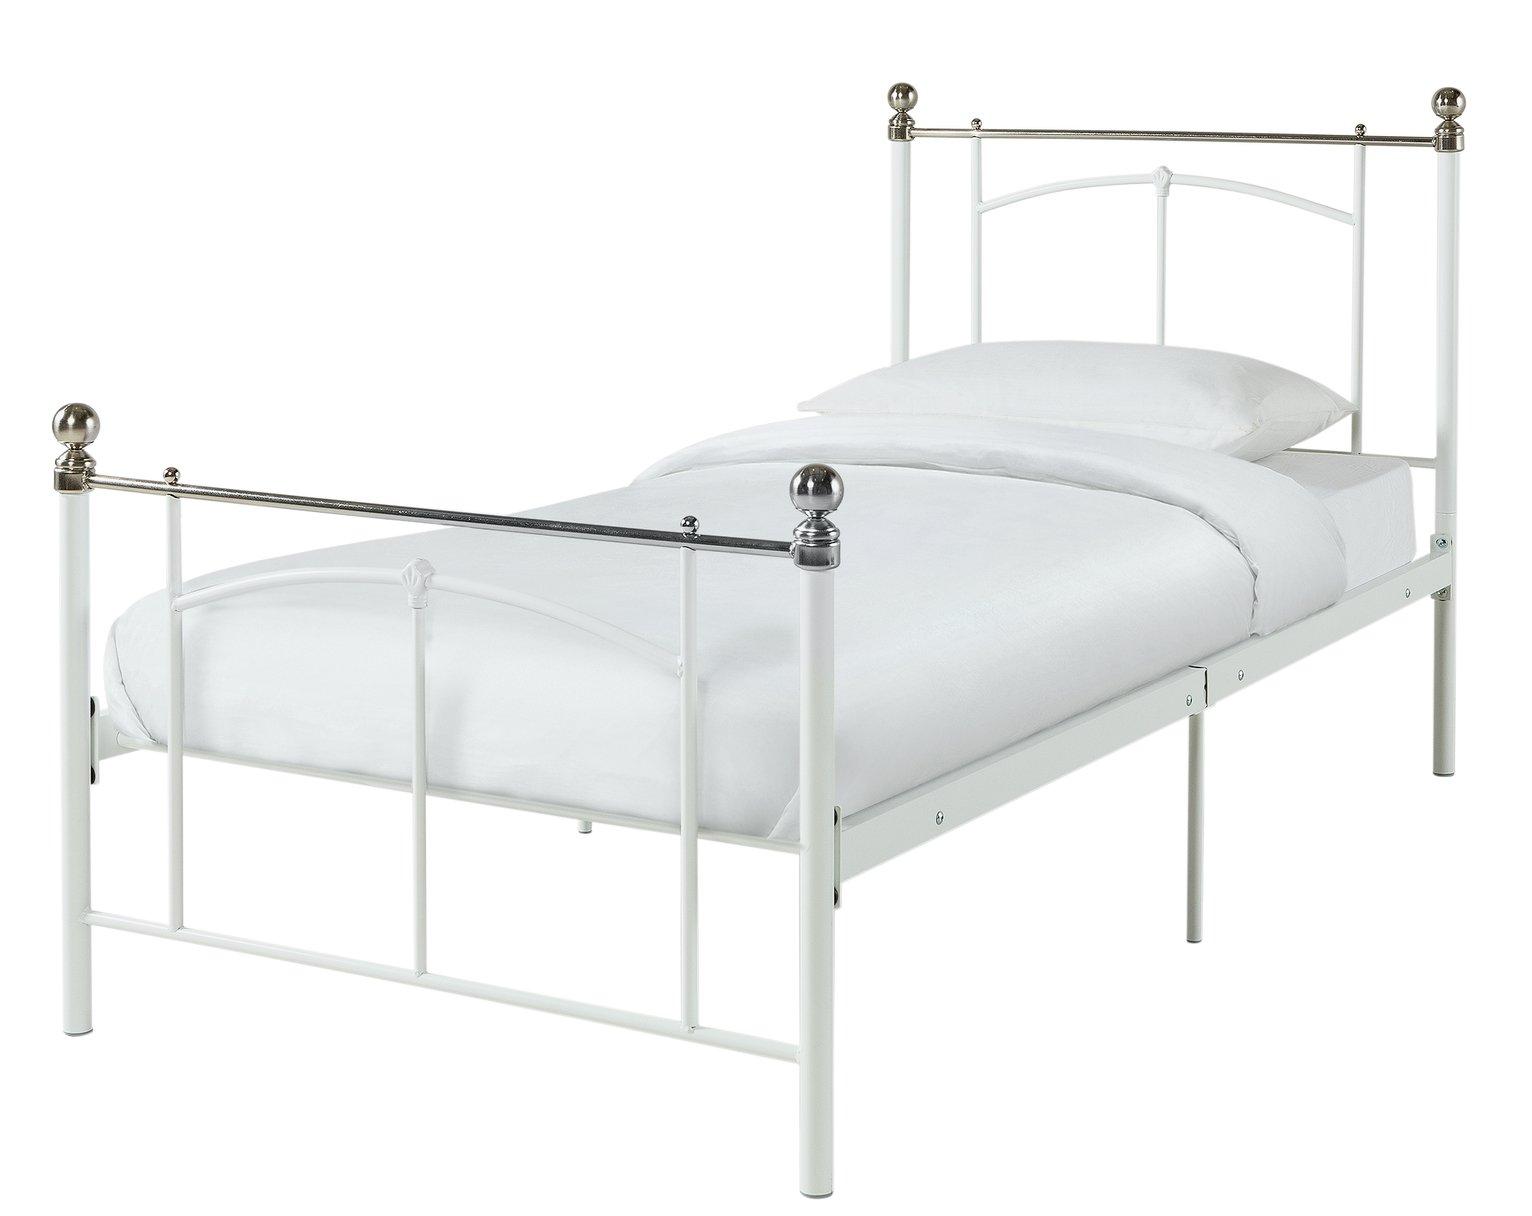 Argos Home Yani Single Bed Frame - White